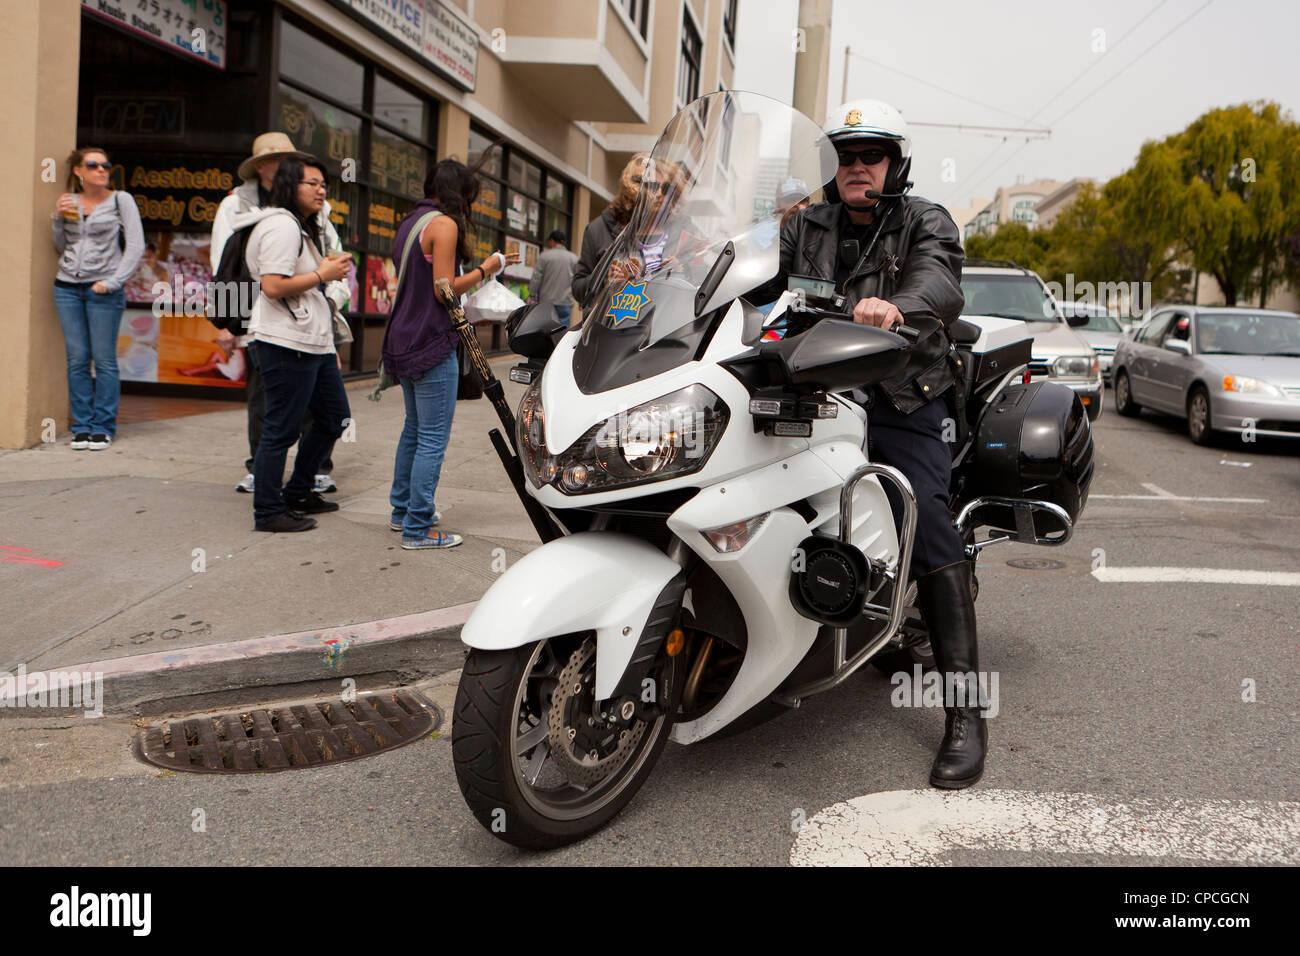 Marvelous Motorcycle Us #2: Stock Photo - US Motorcycle Cop - San Francisco, California USA